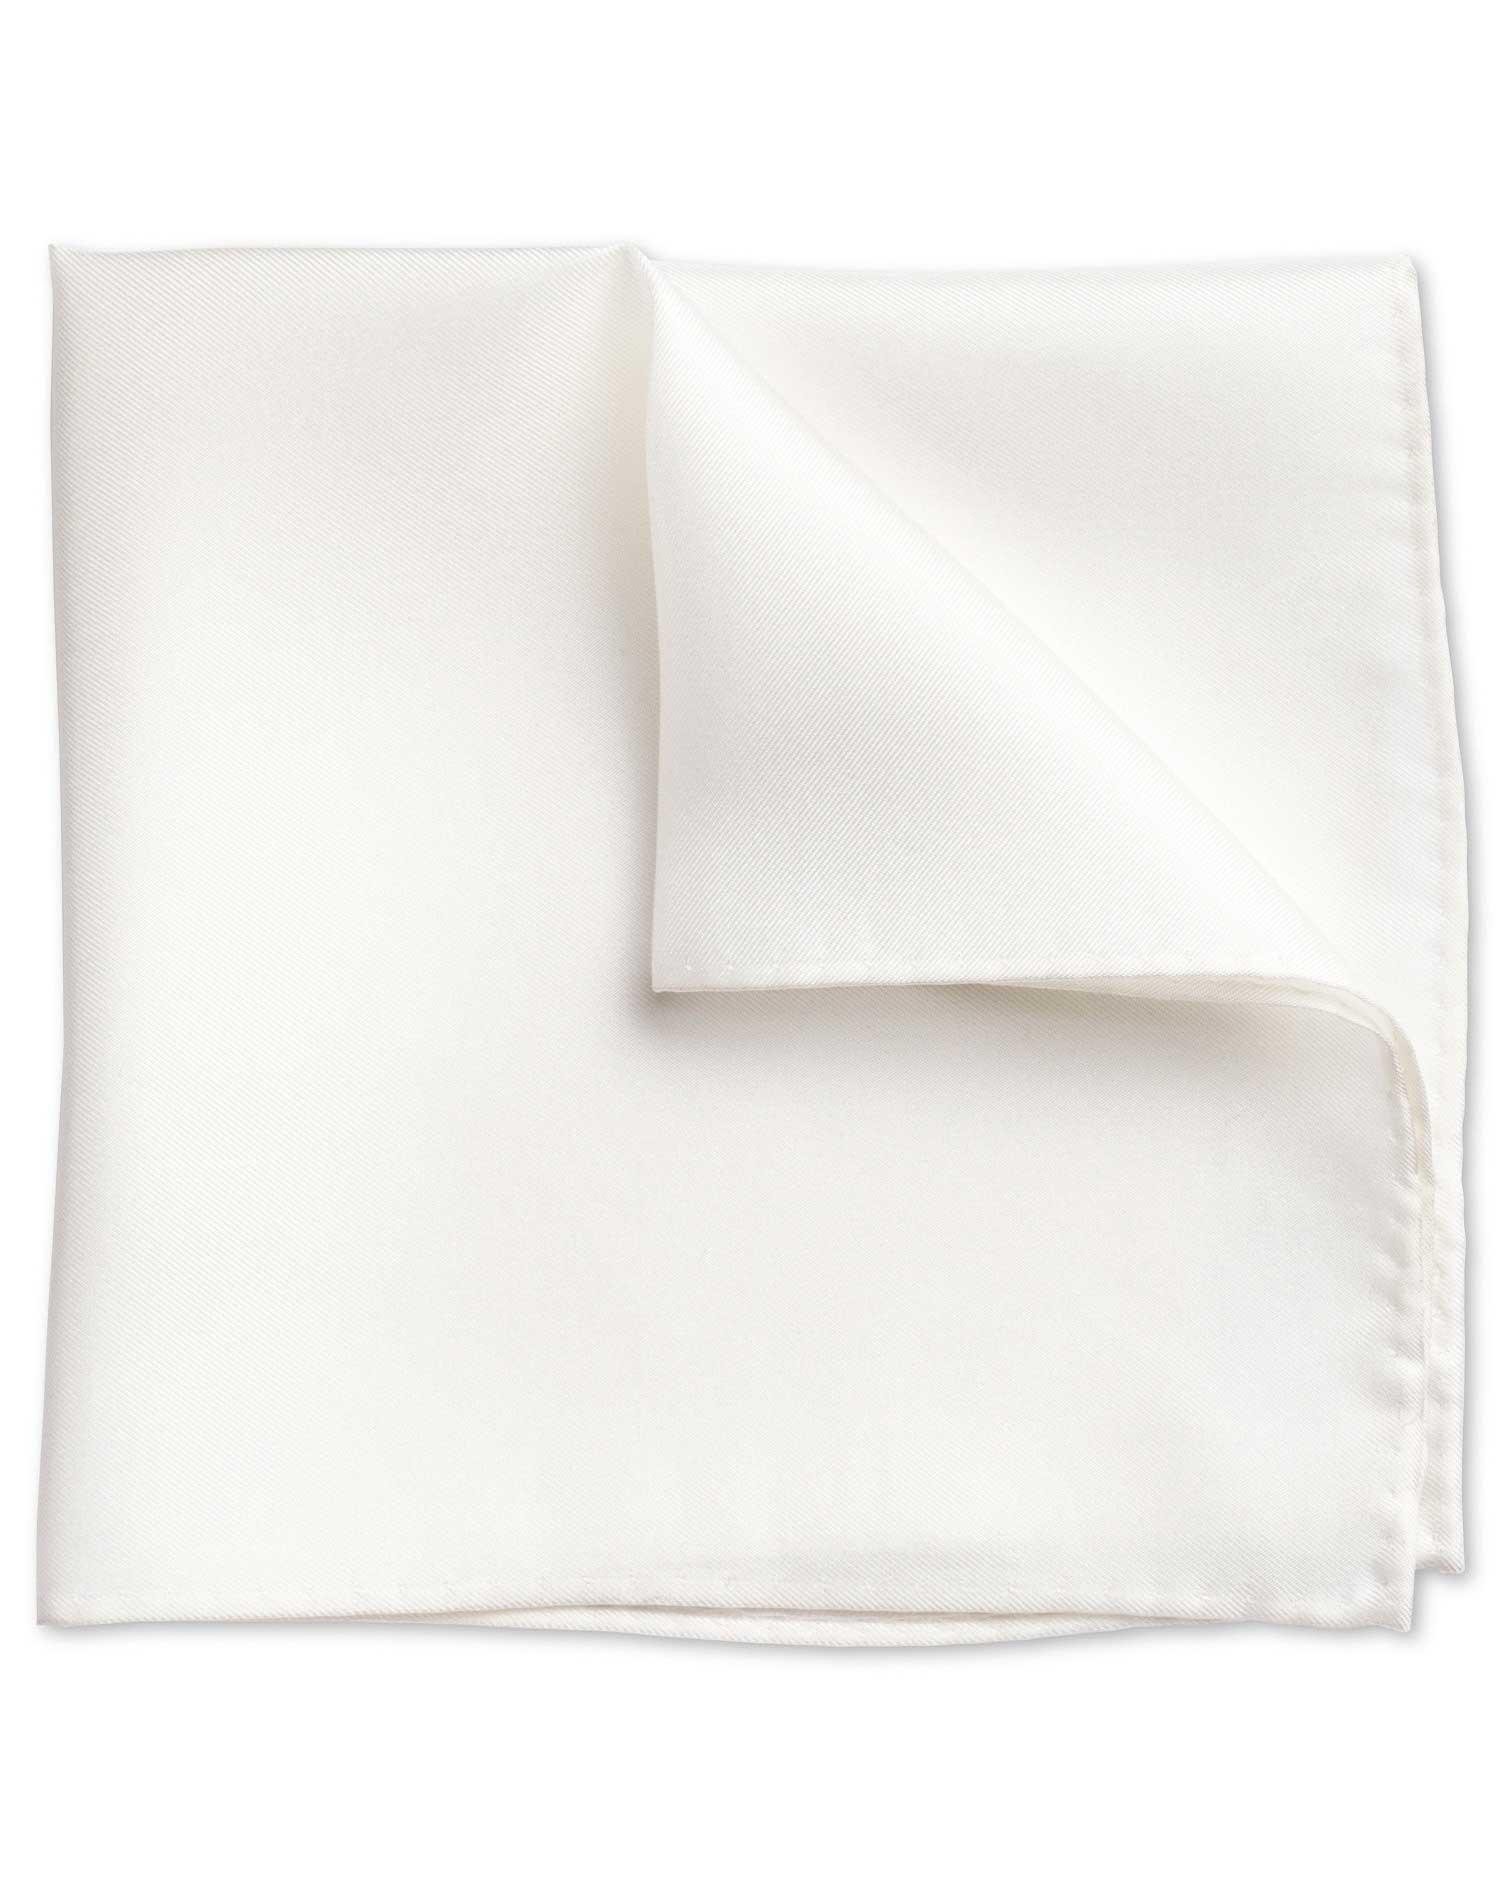 pocket square.jpg